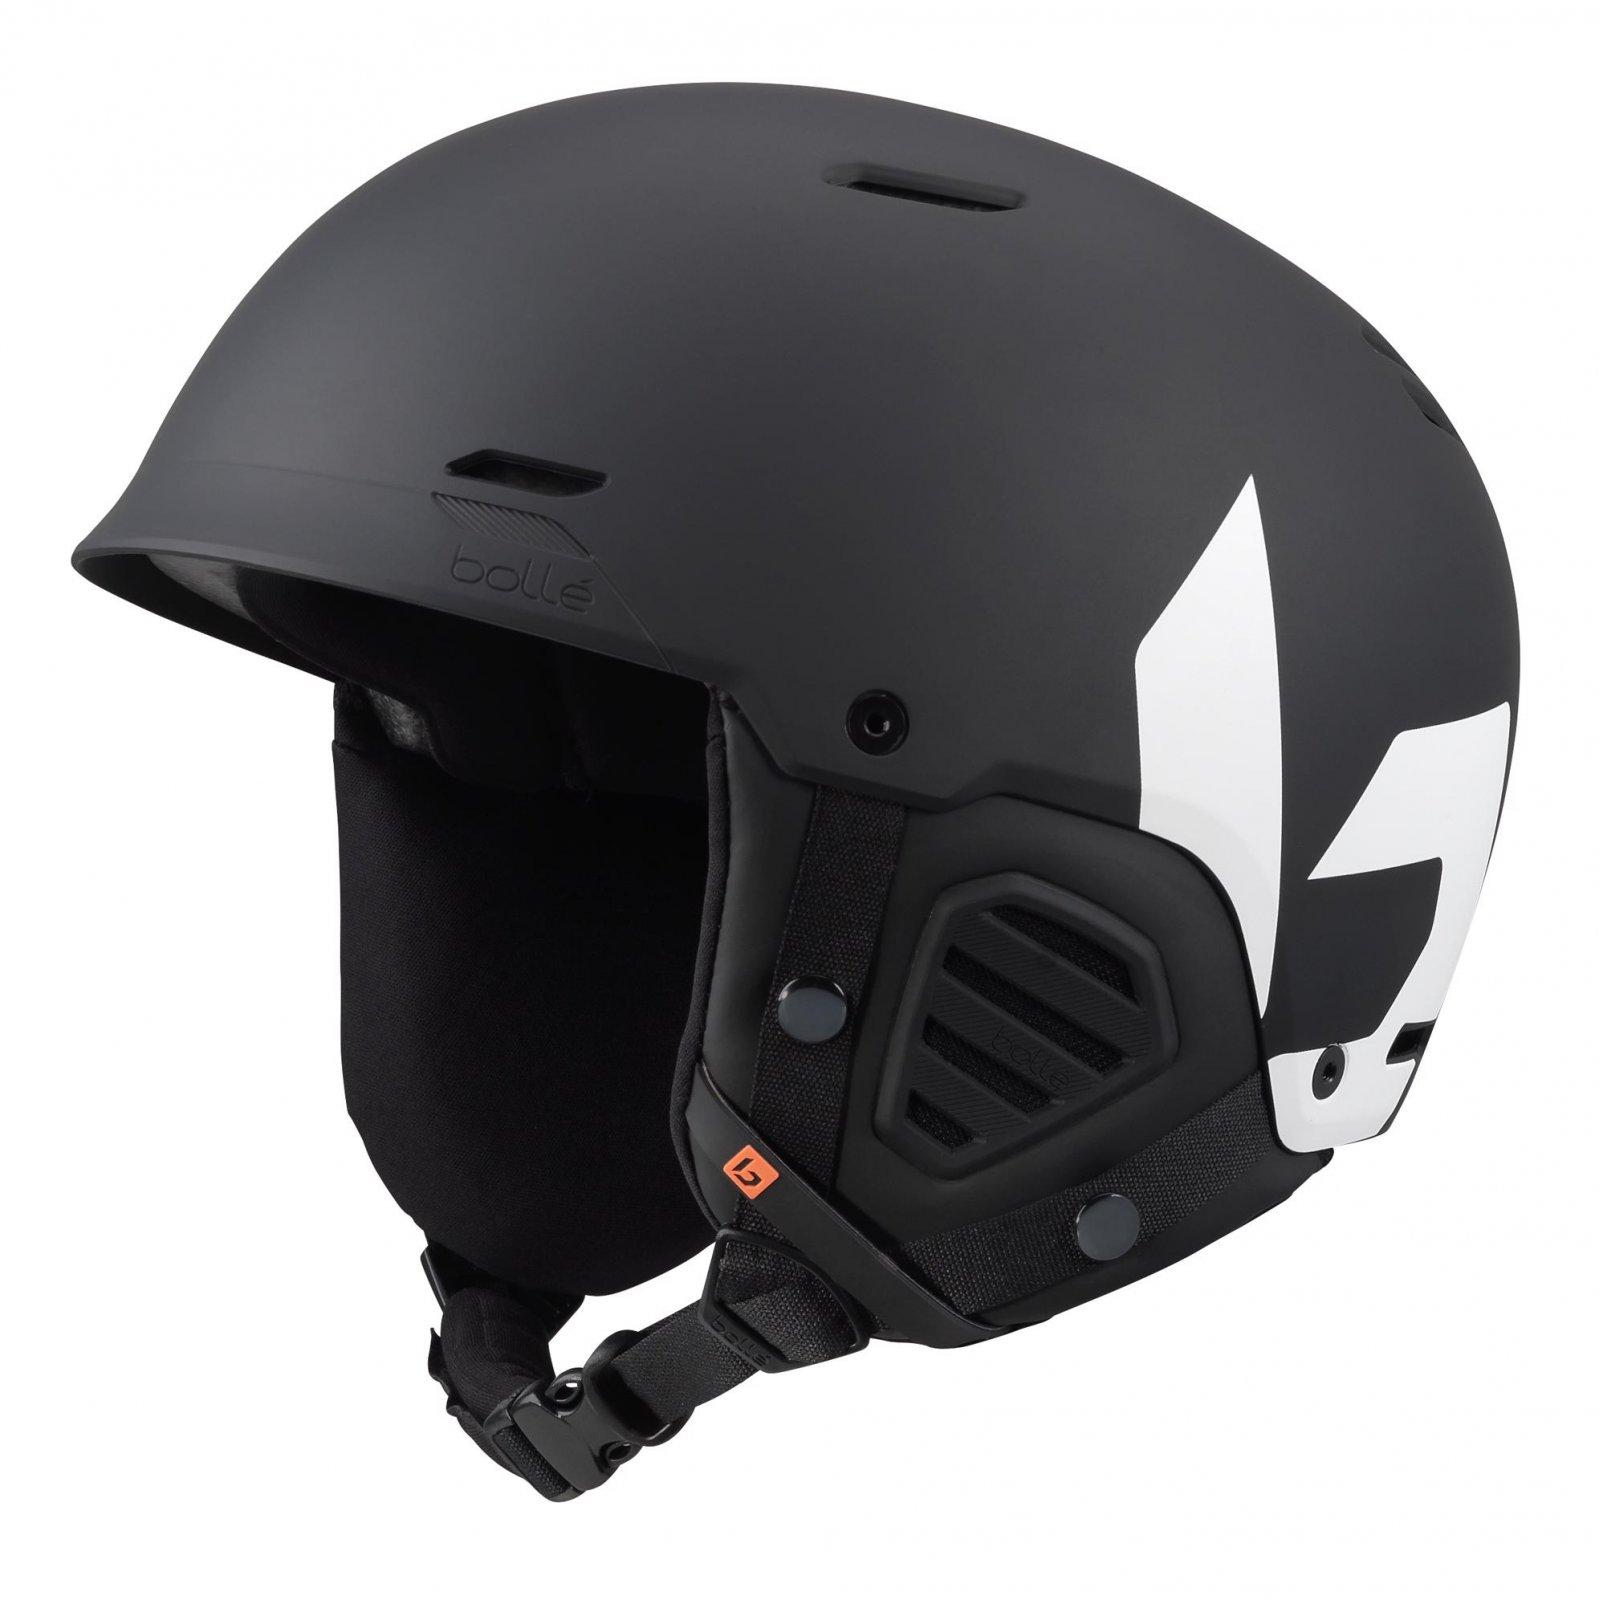 Bolle Mute Helmet